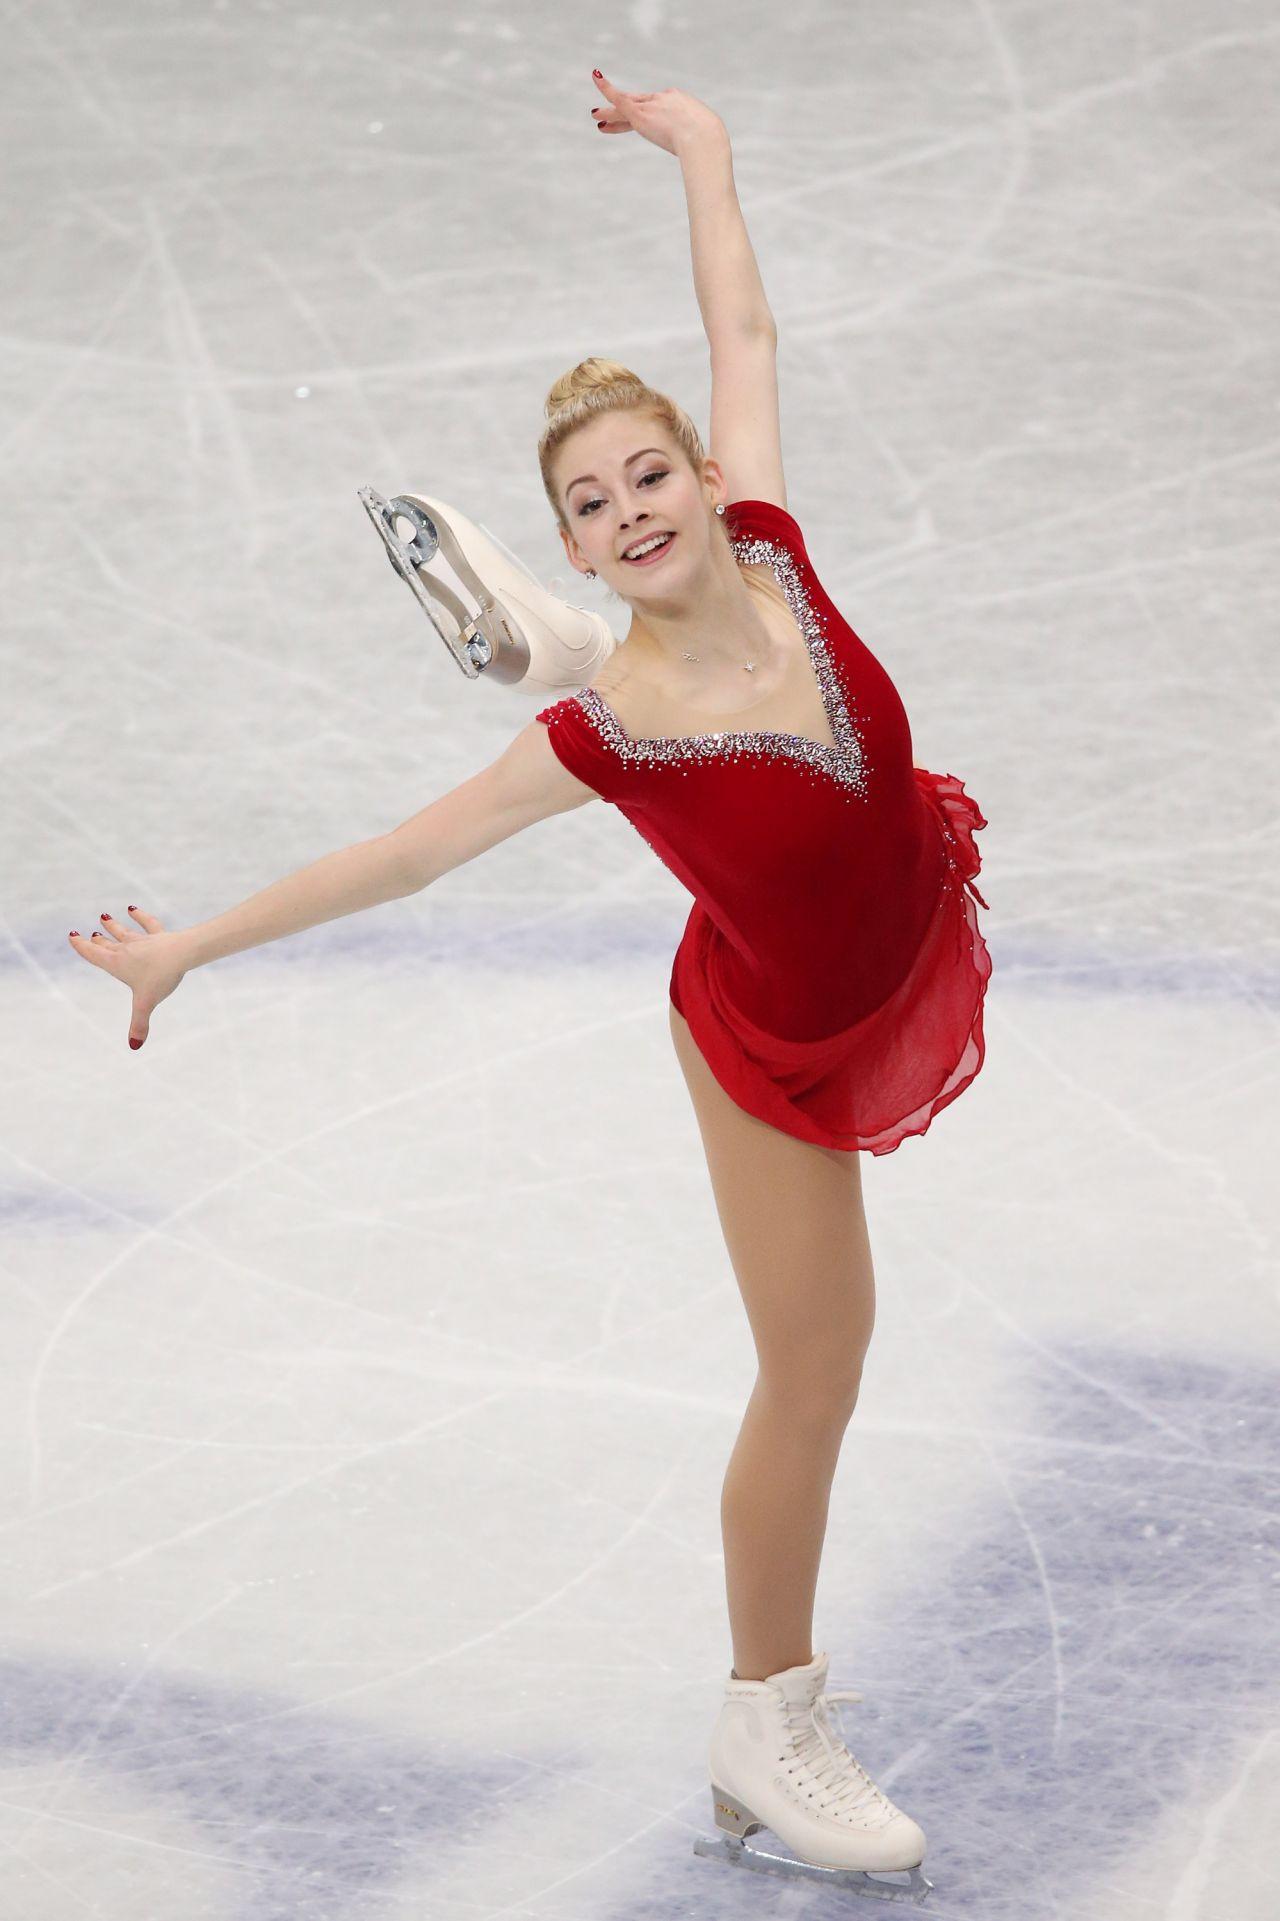 Gracie Gold - ISU World Figure Skating Championships - March 2014